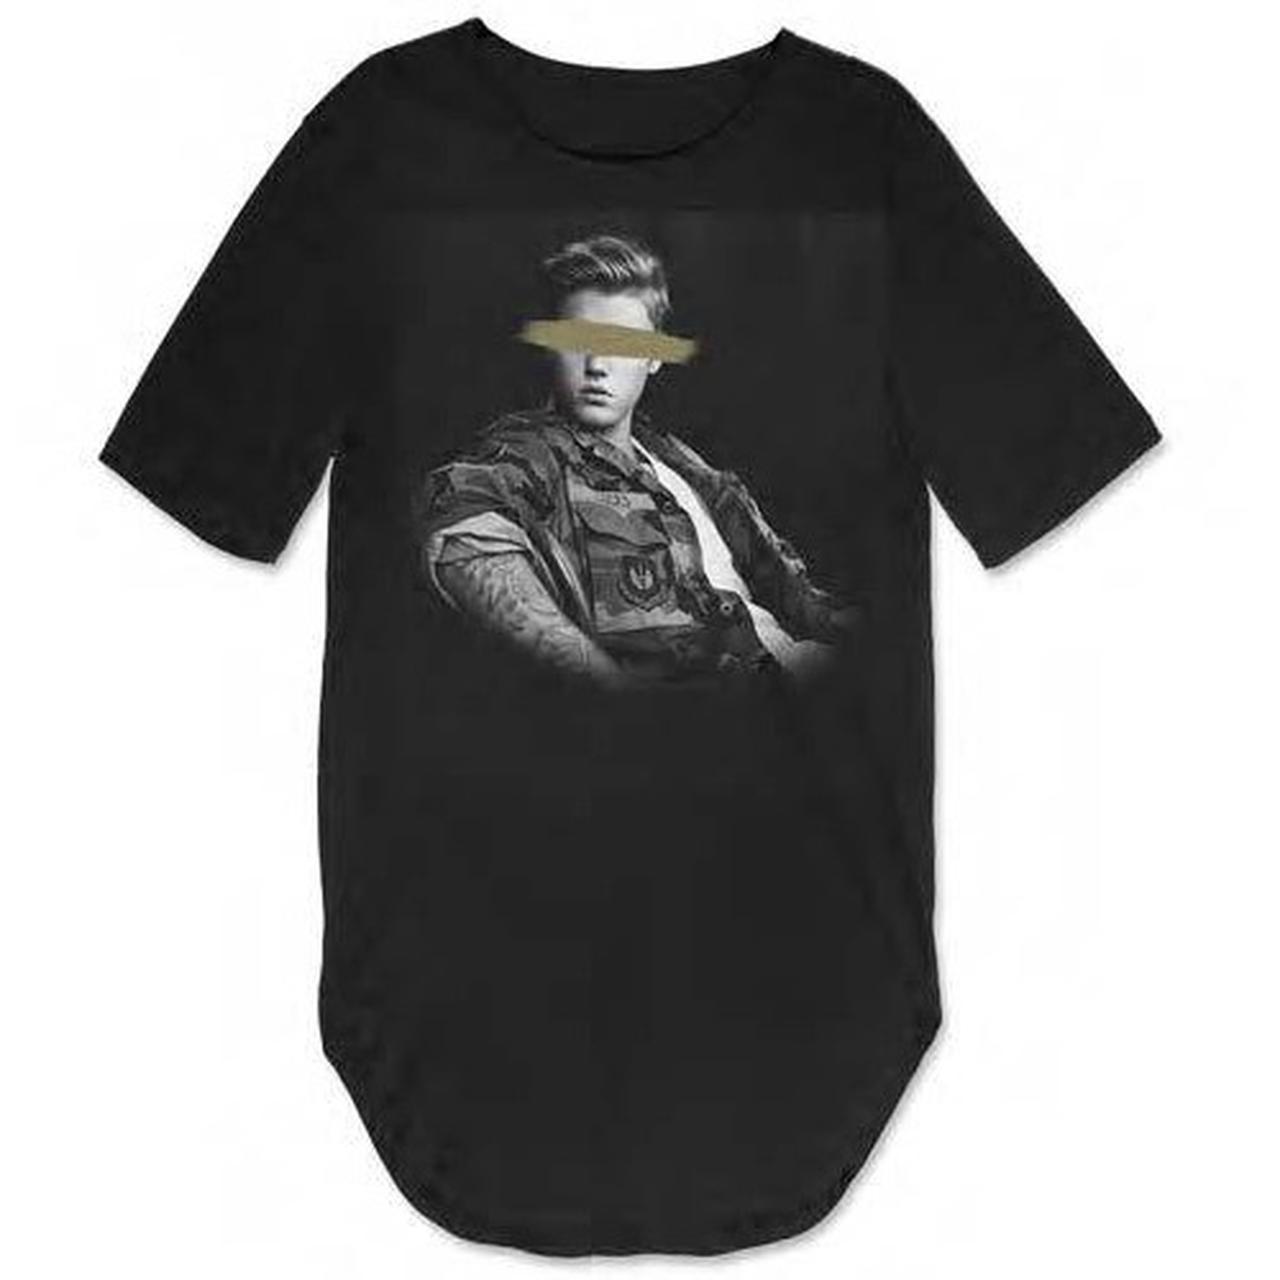 Justin bieber black rounded shirt blocked eyes for Justin bieber black and white shirt